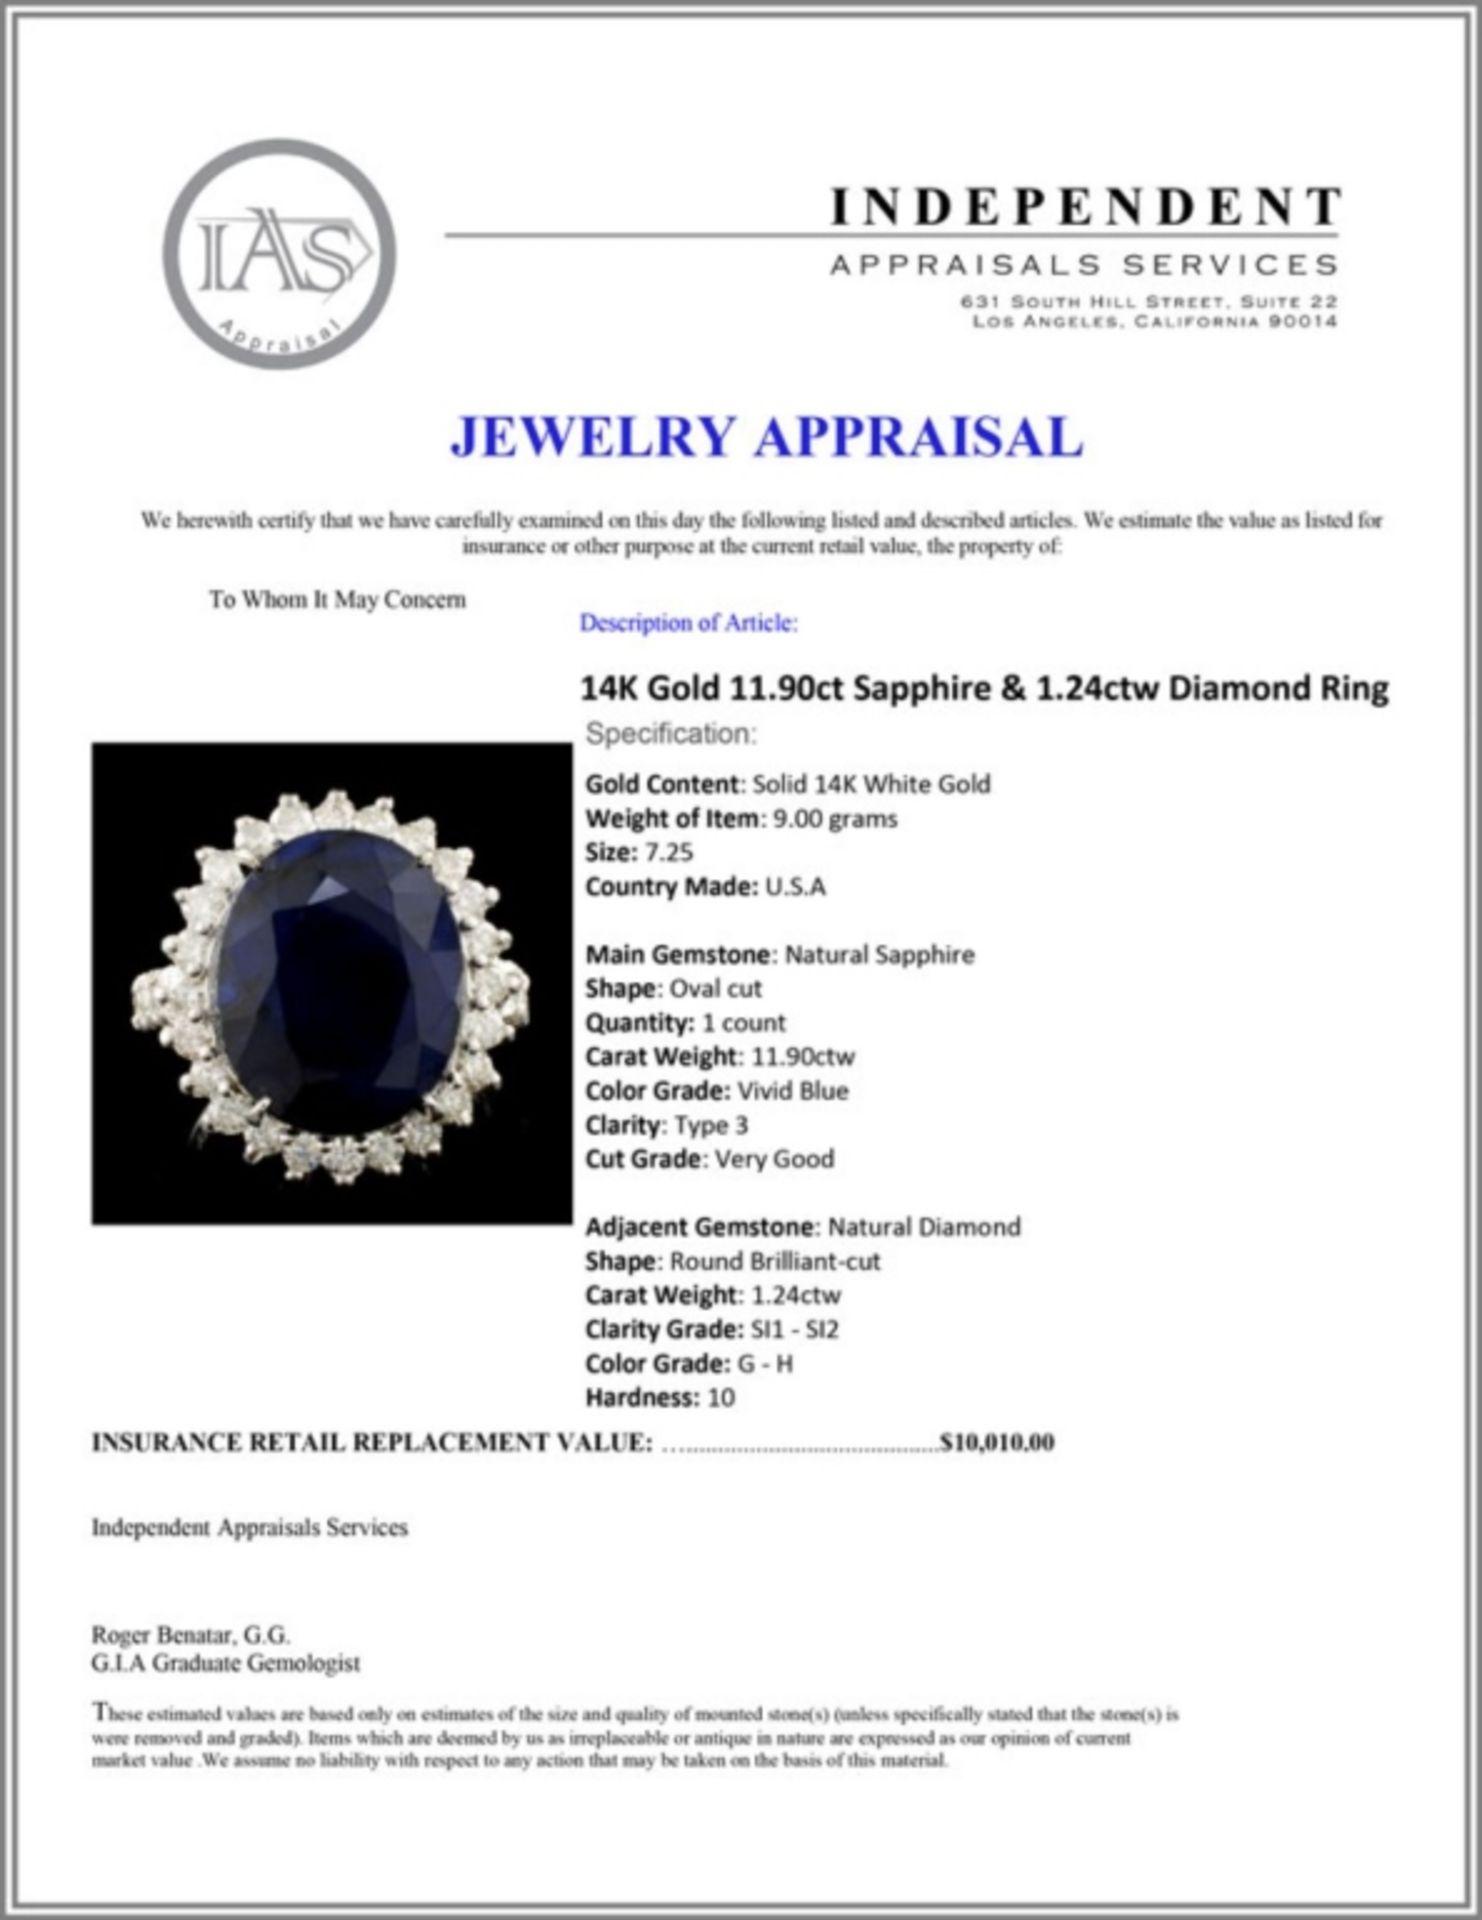 14K Gold 11.90ct Sapphire & 1.24ctw Diamond Ring - Image 5 of 5